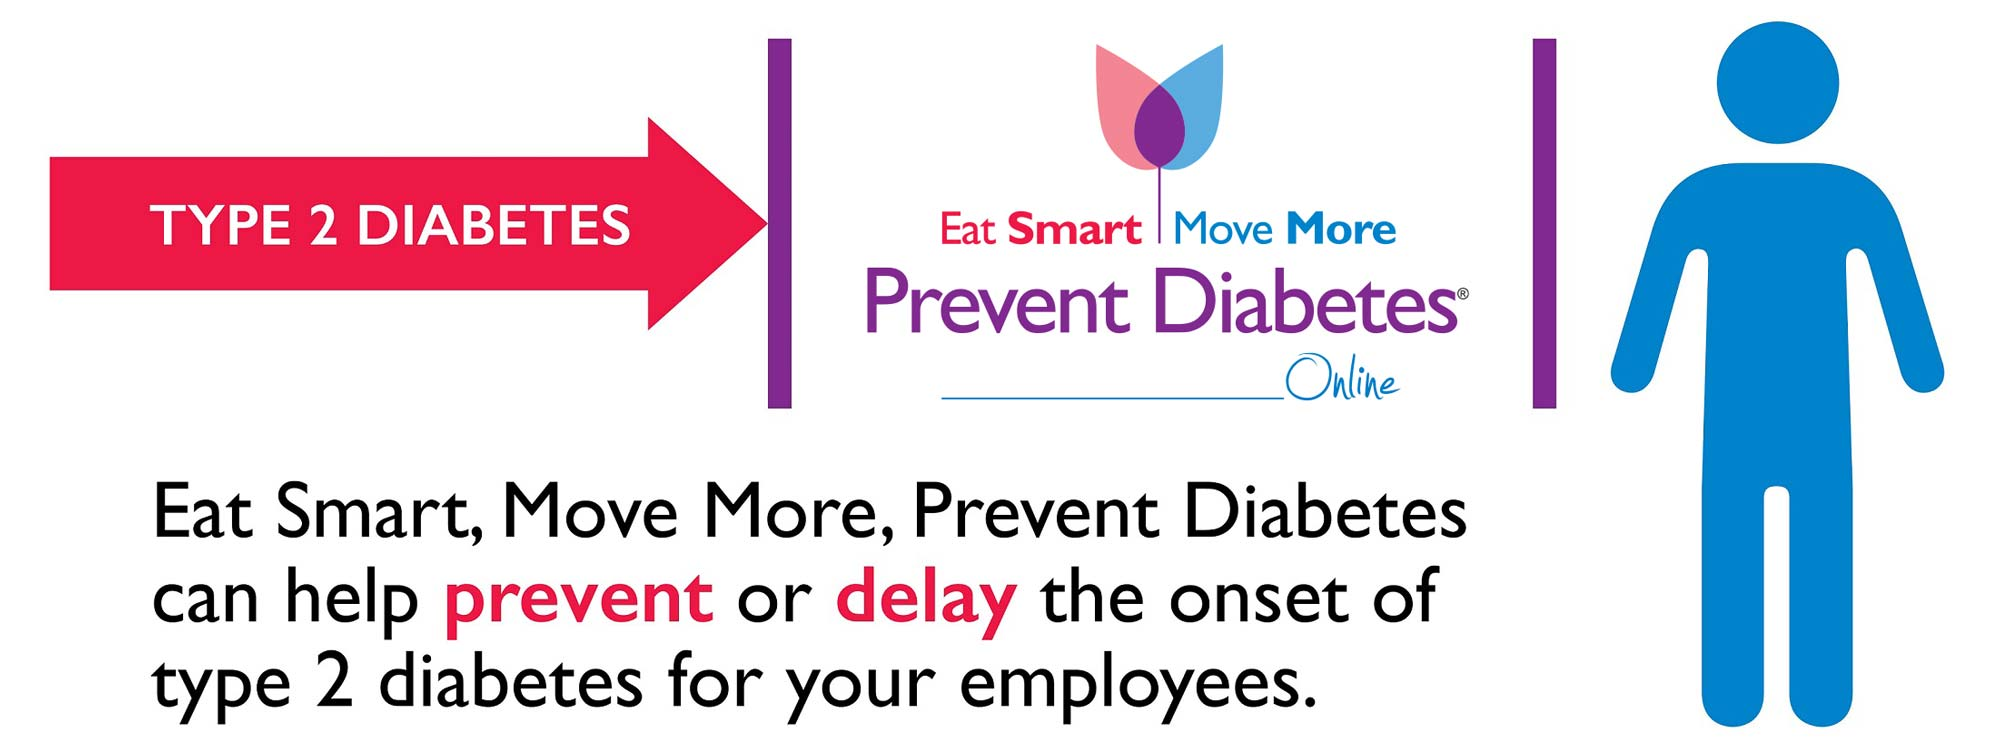 Delay Type 2 Diabetes